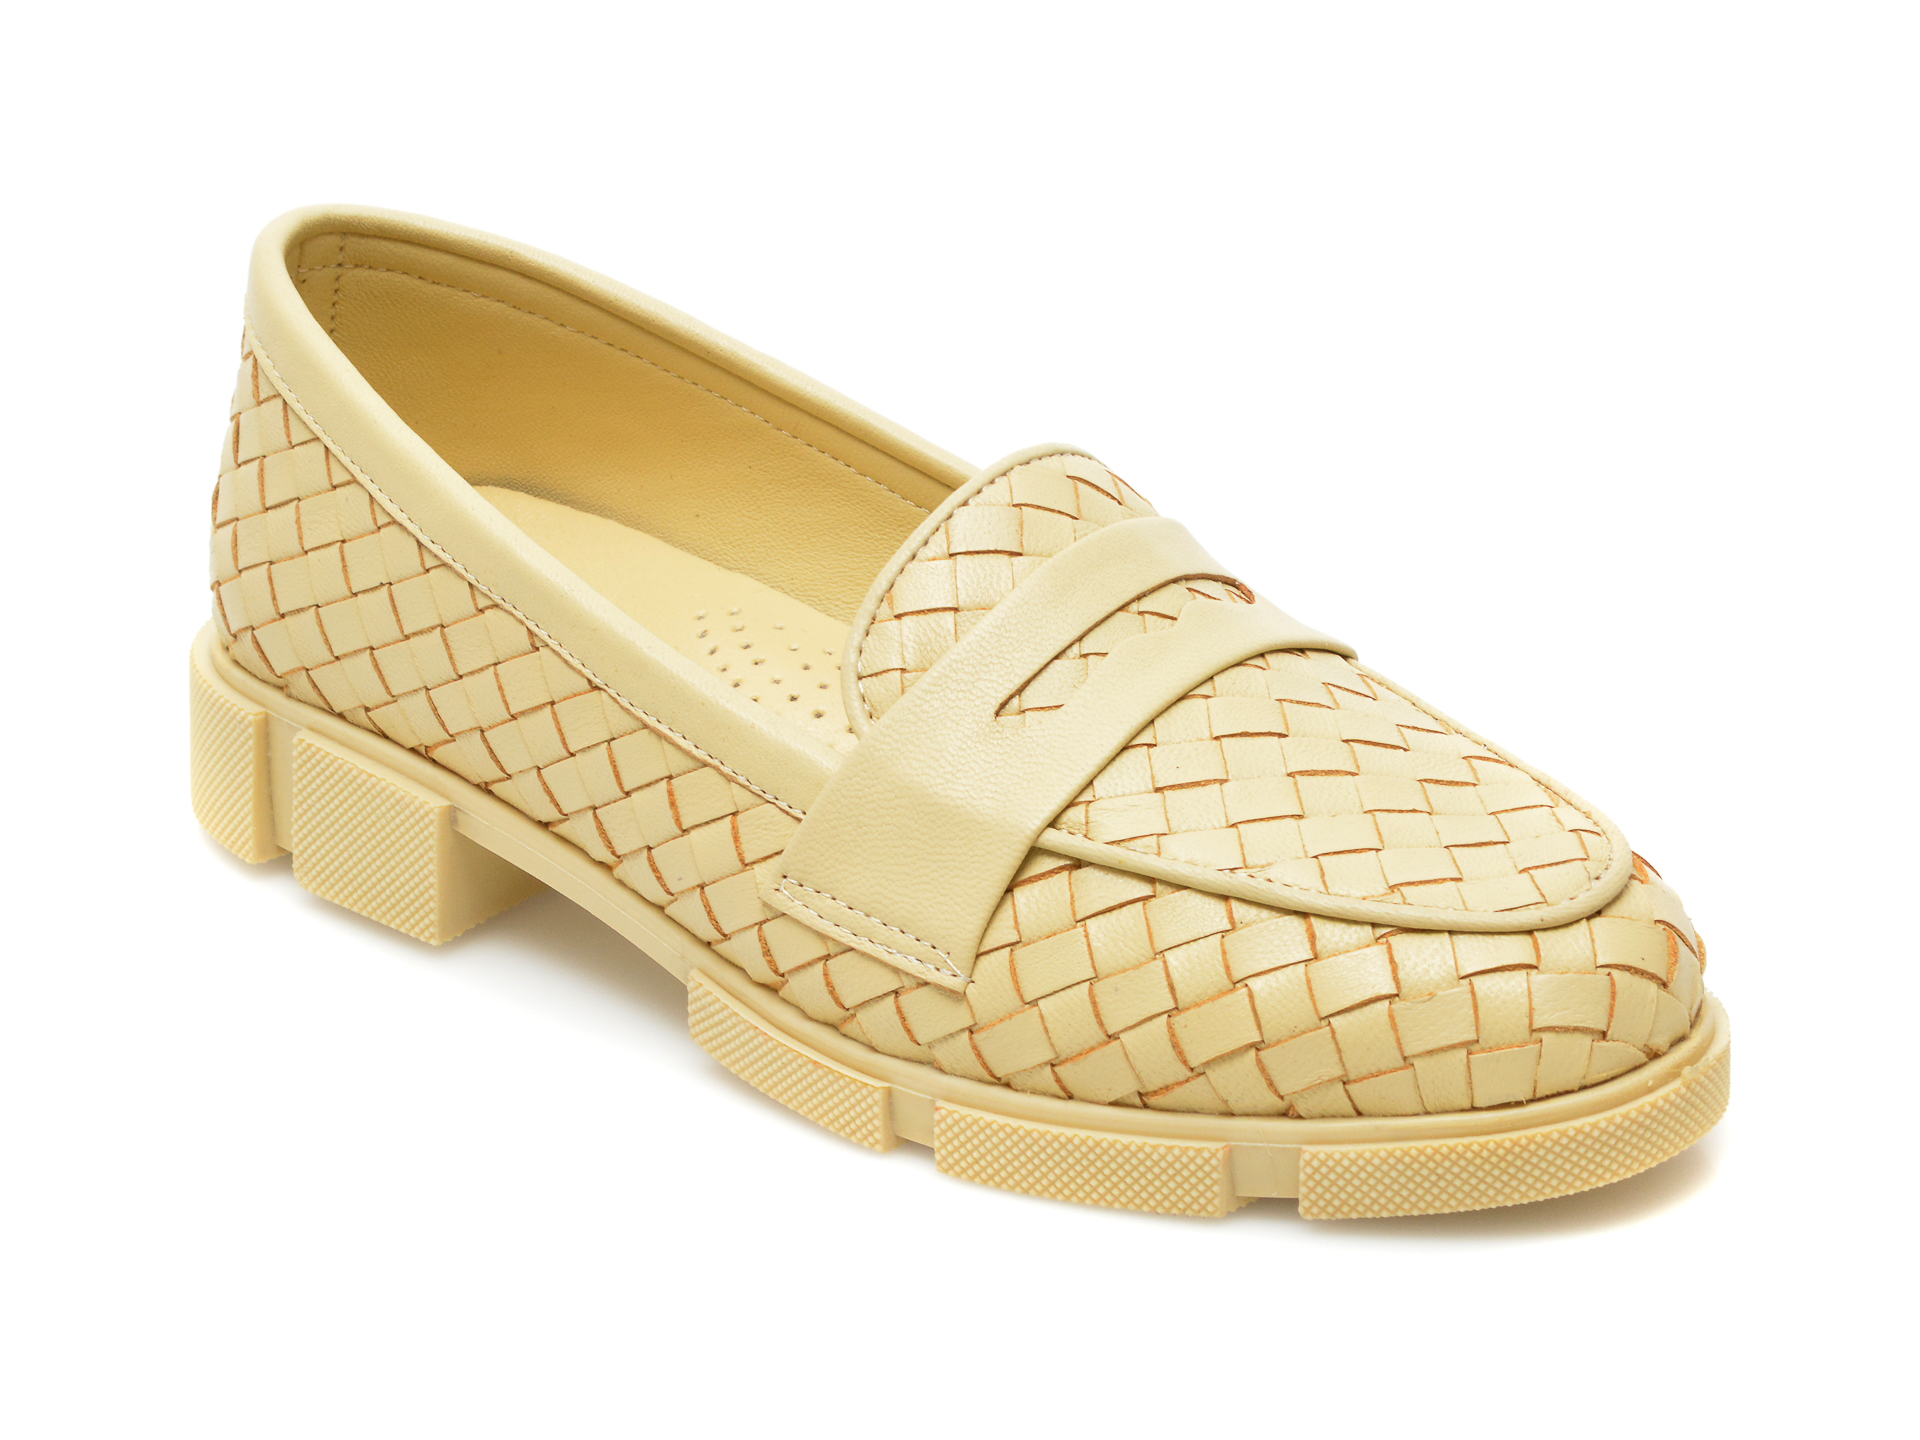 Pantofi MOLLY BESSA galbeni, MN108, din piele naturala